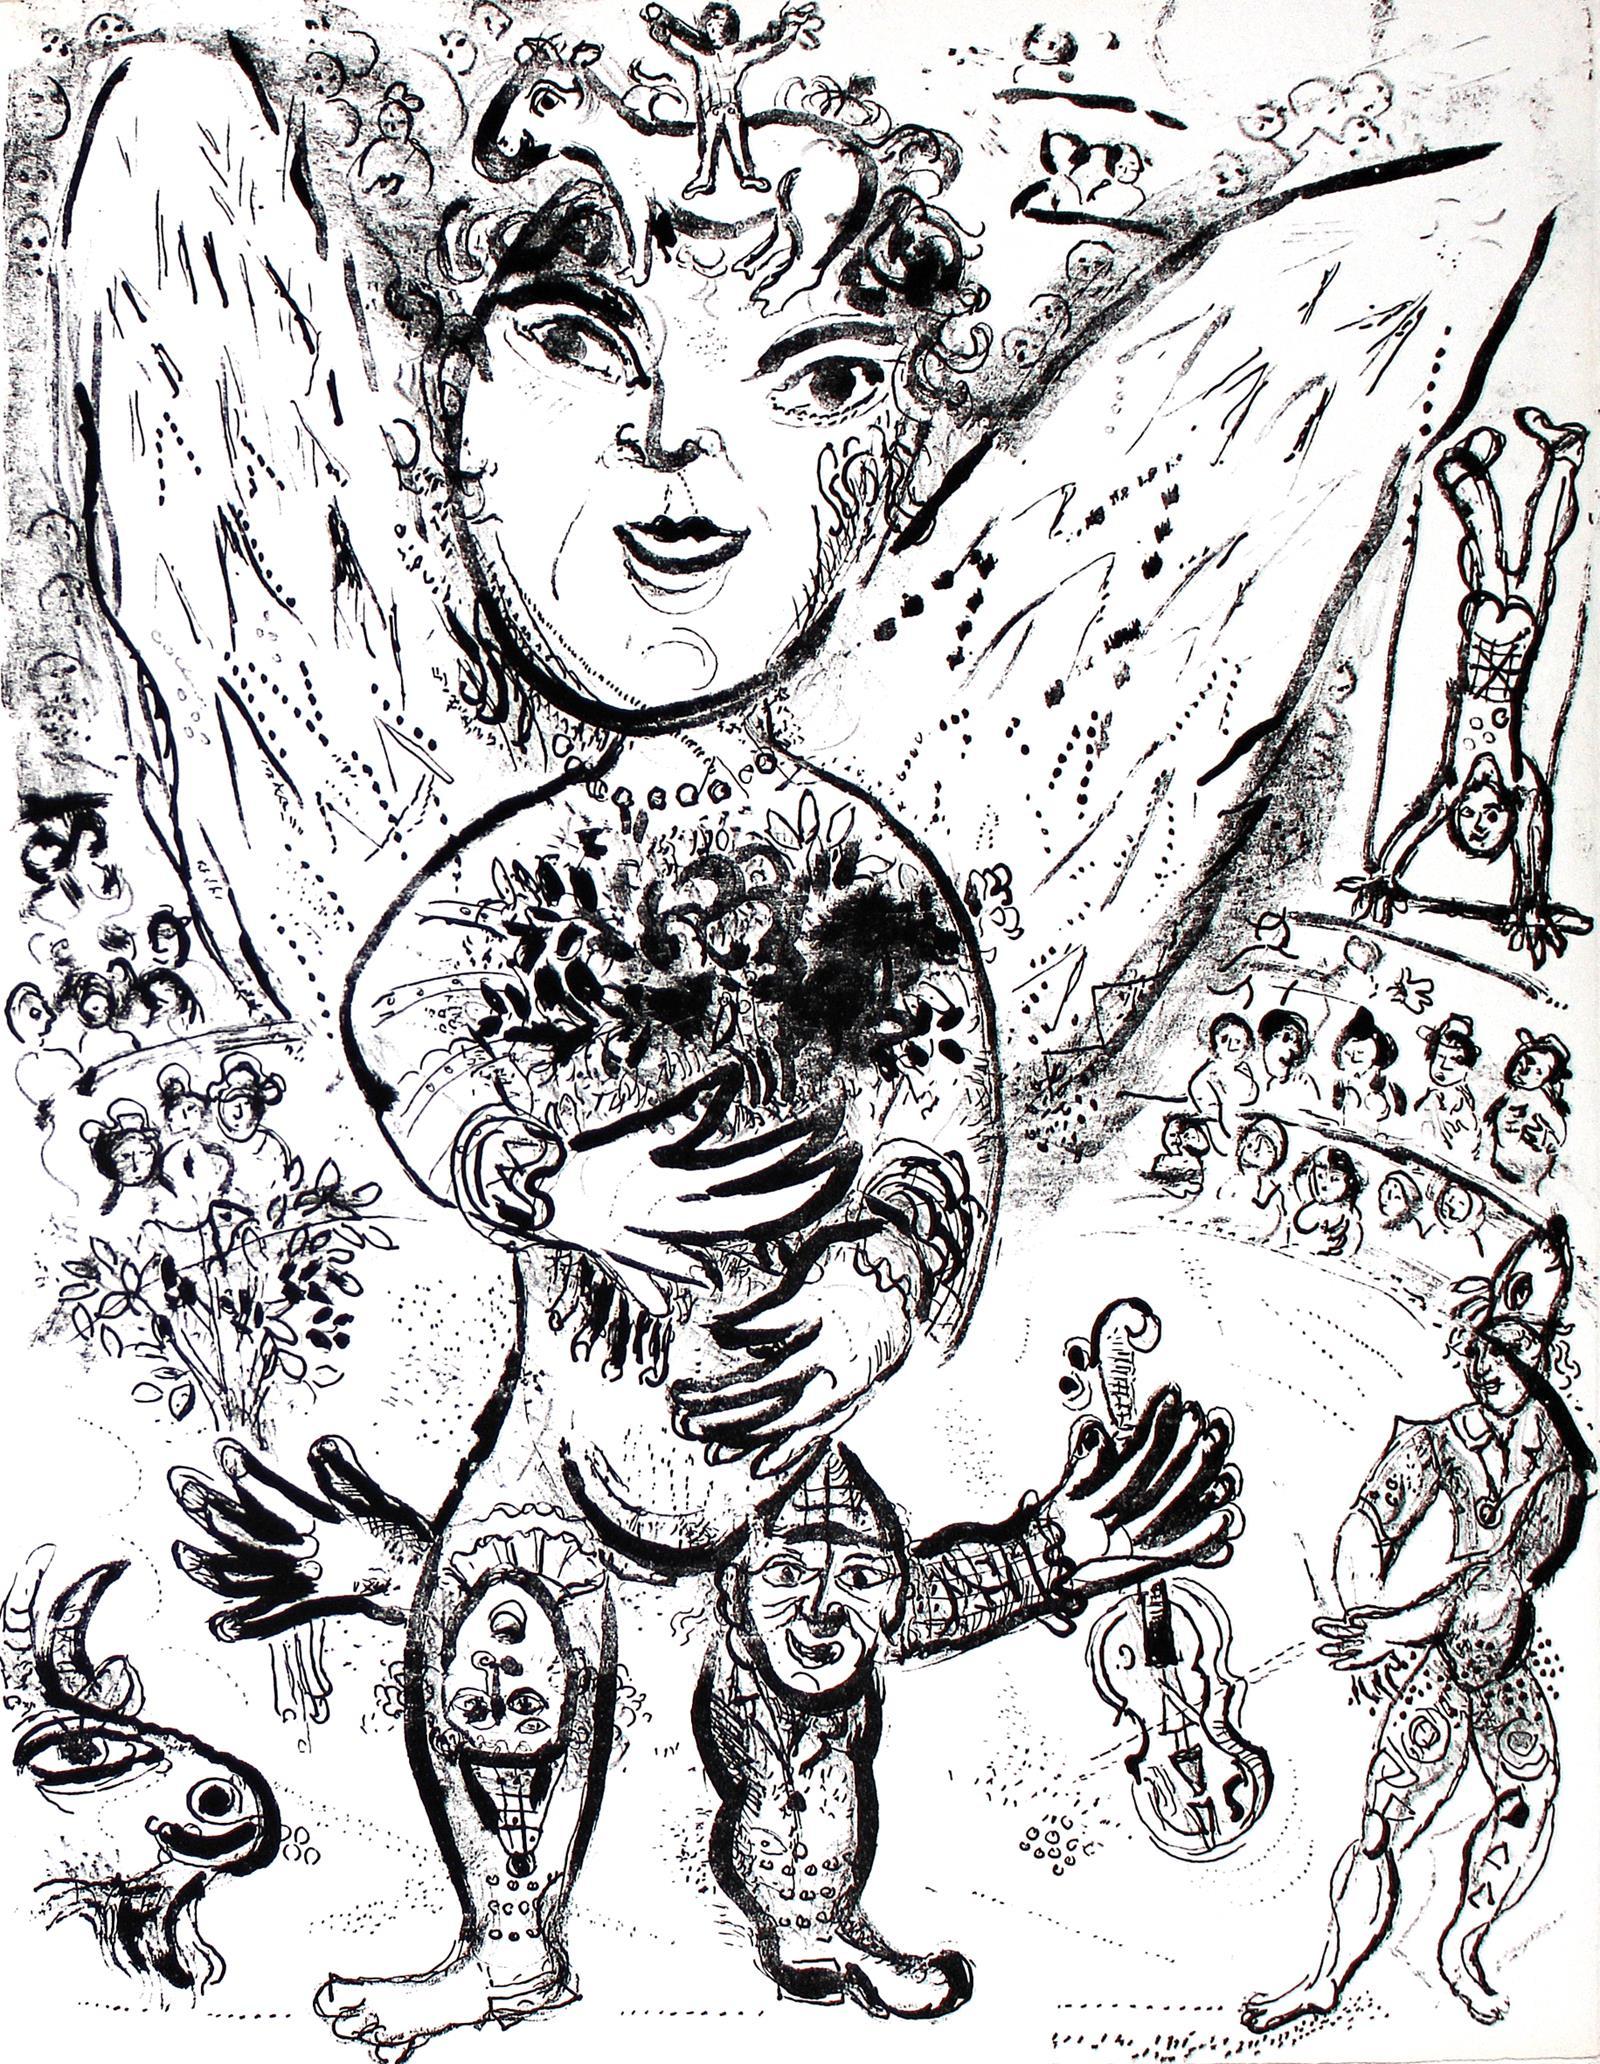 Chagall, Marc.